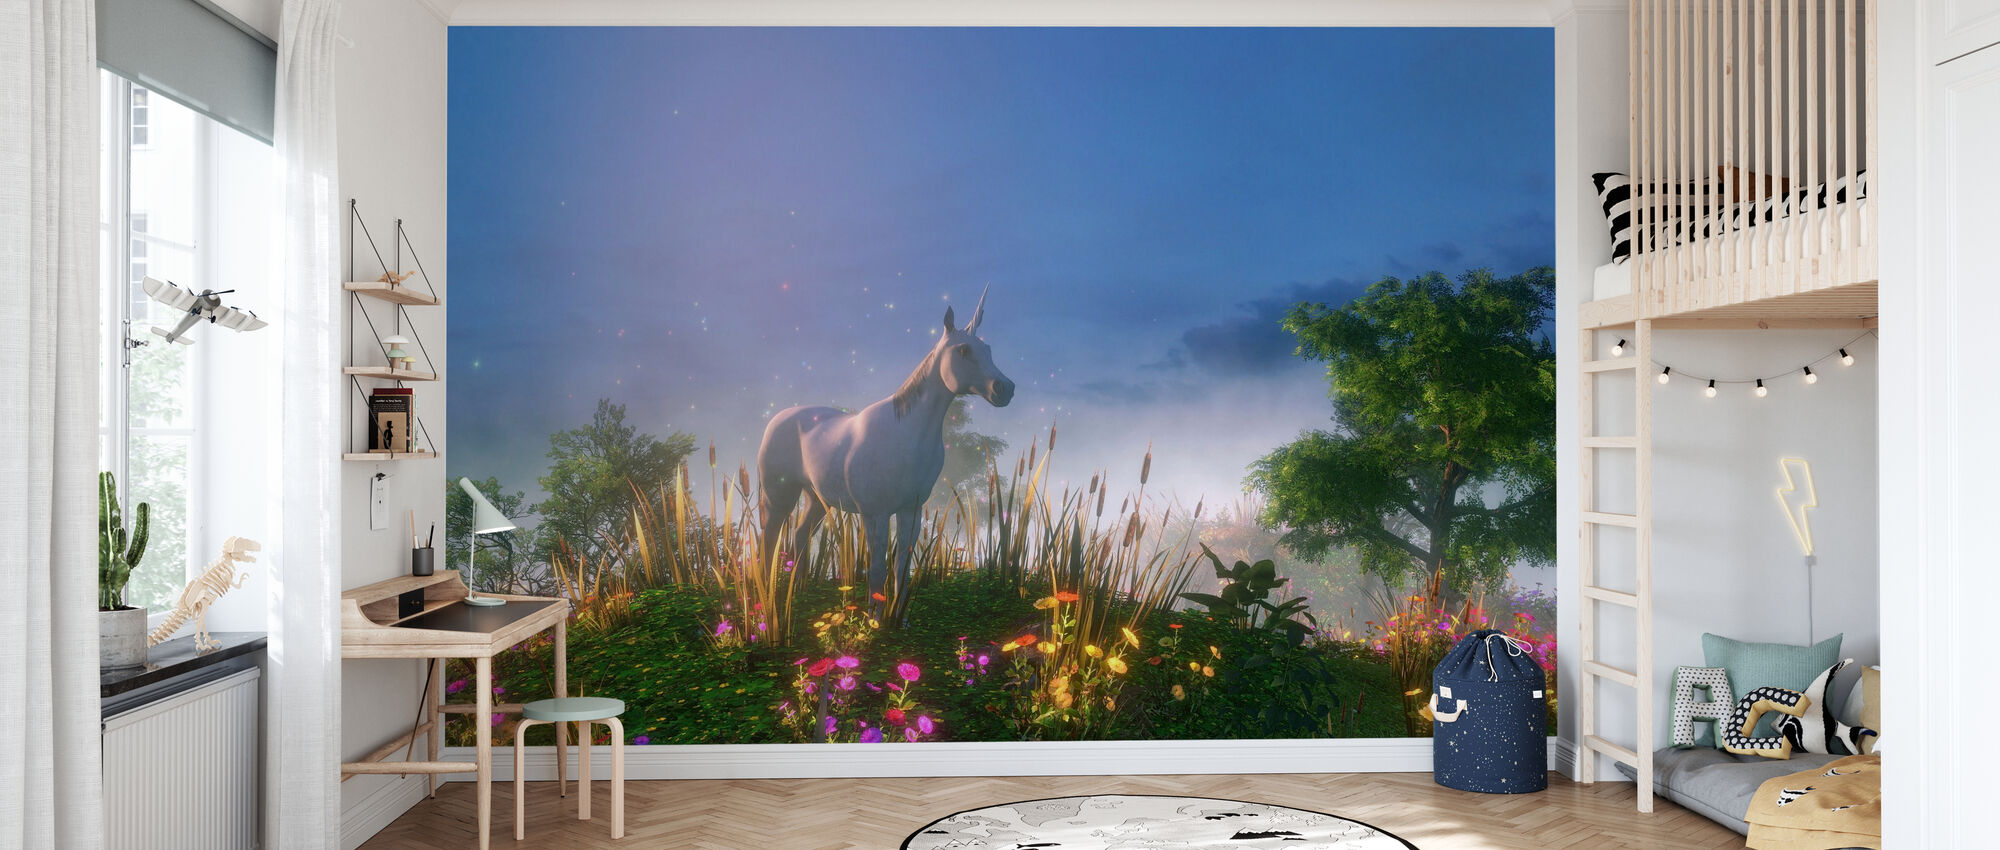 Unicorn in the Wild - Wallpaper - Kids Room